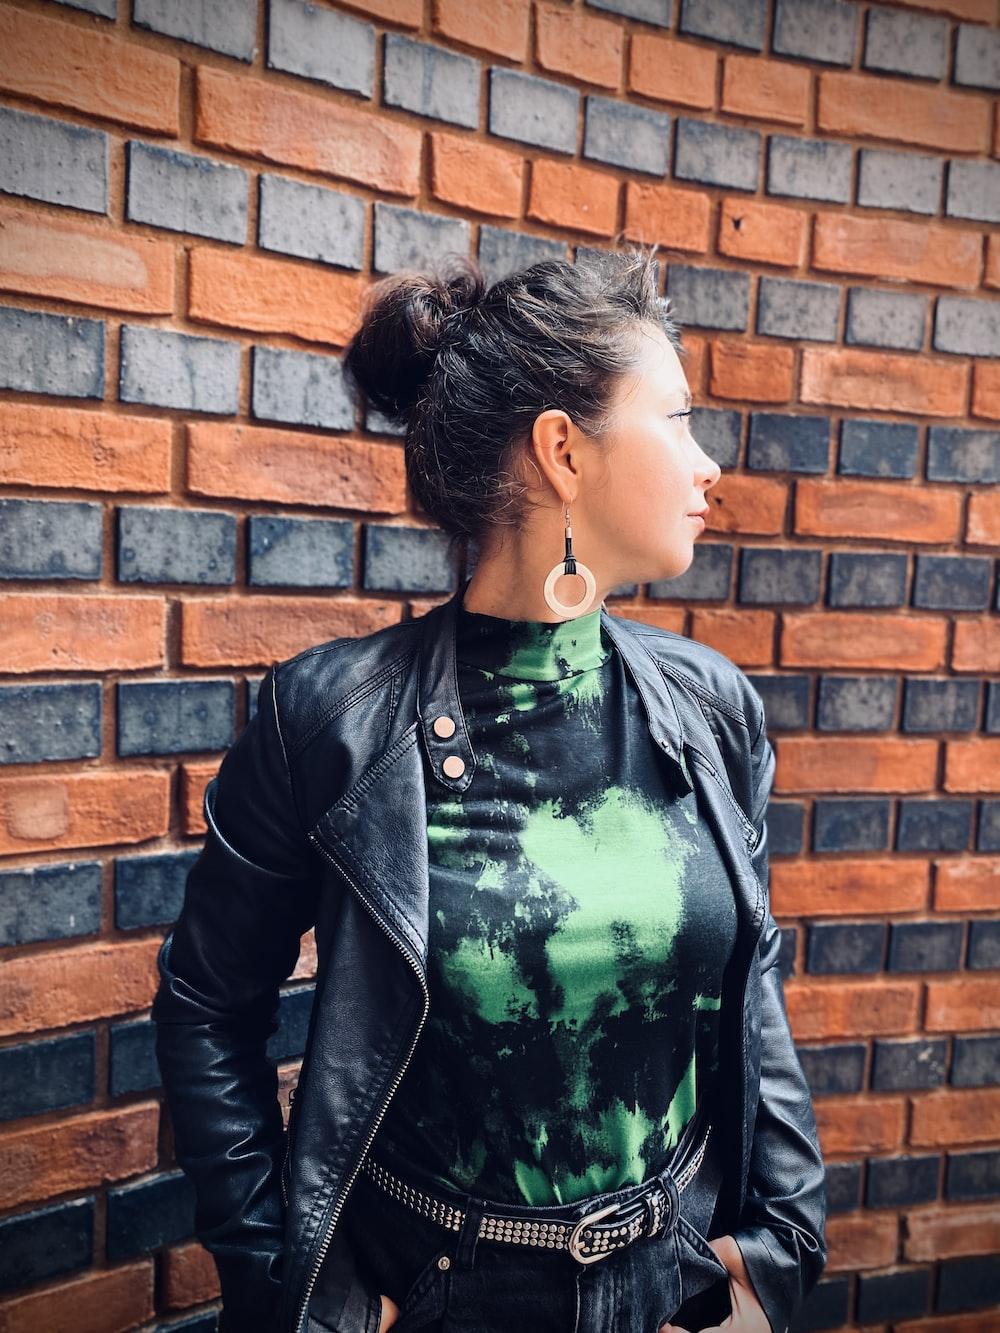 woman in black leather jacket standing beside brown brick wall